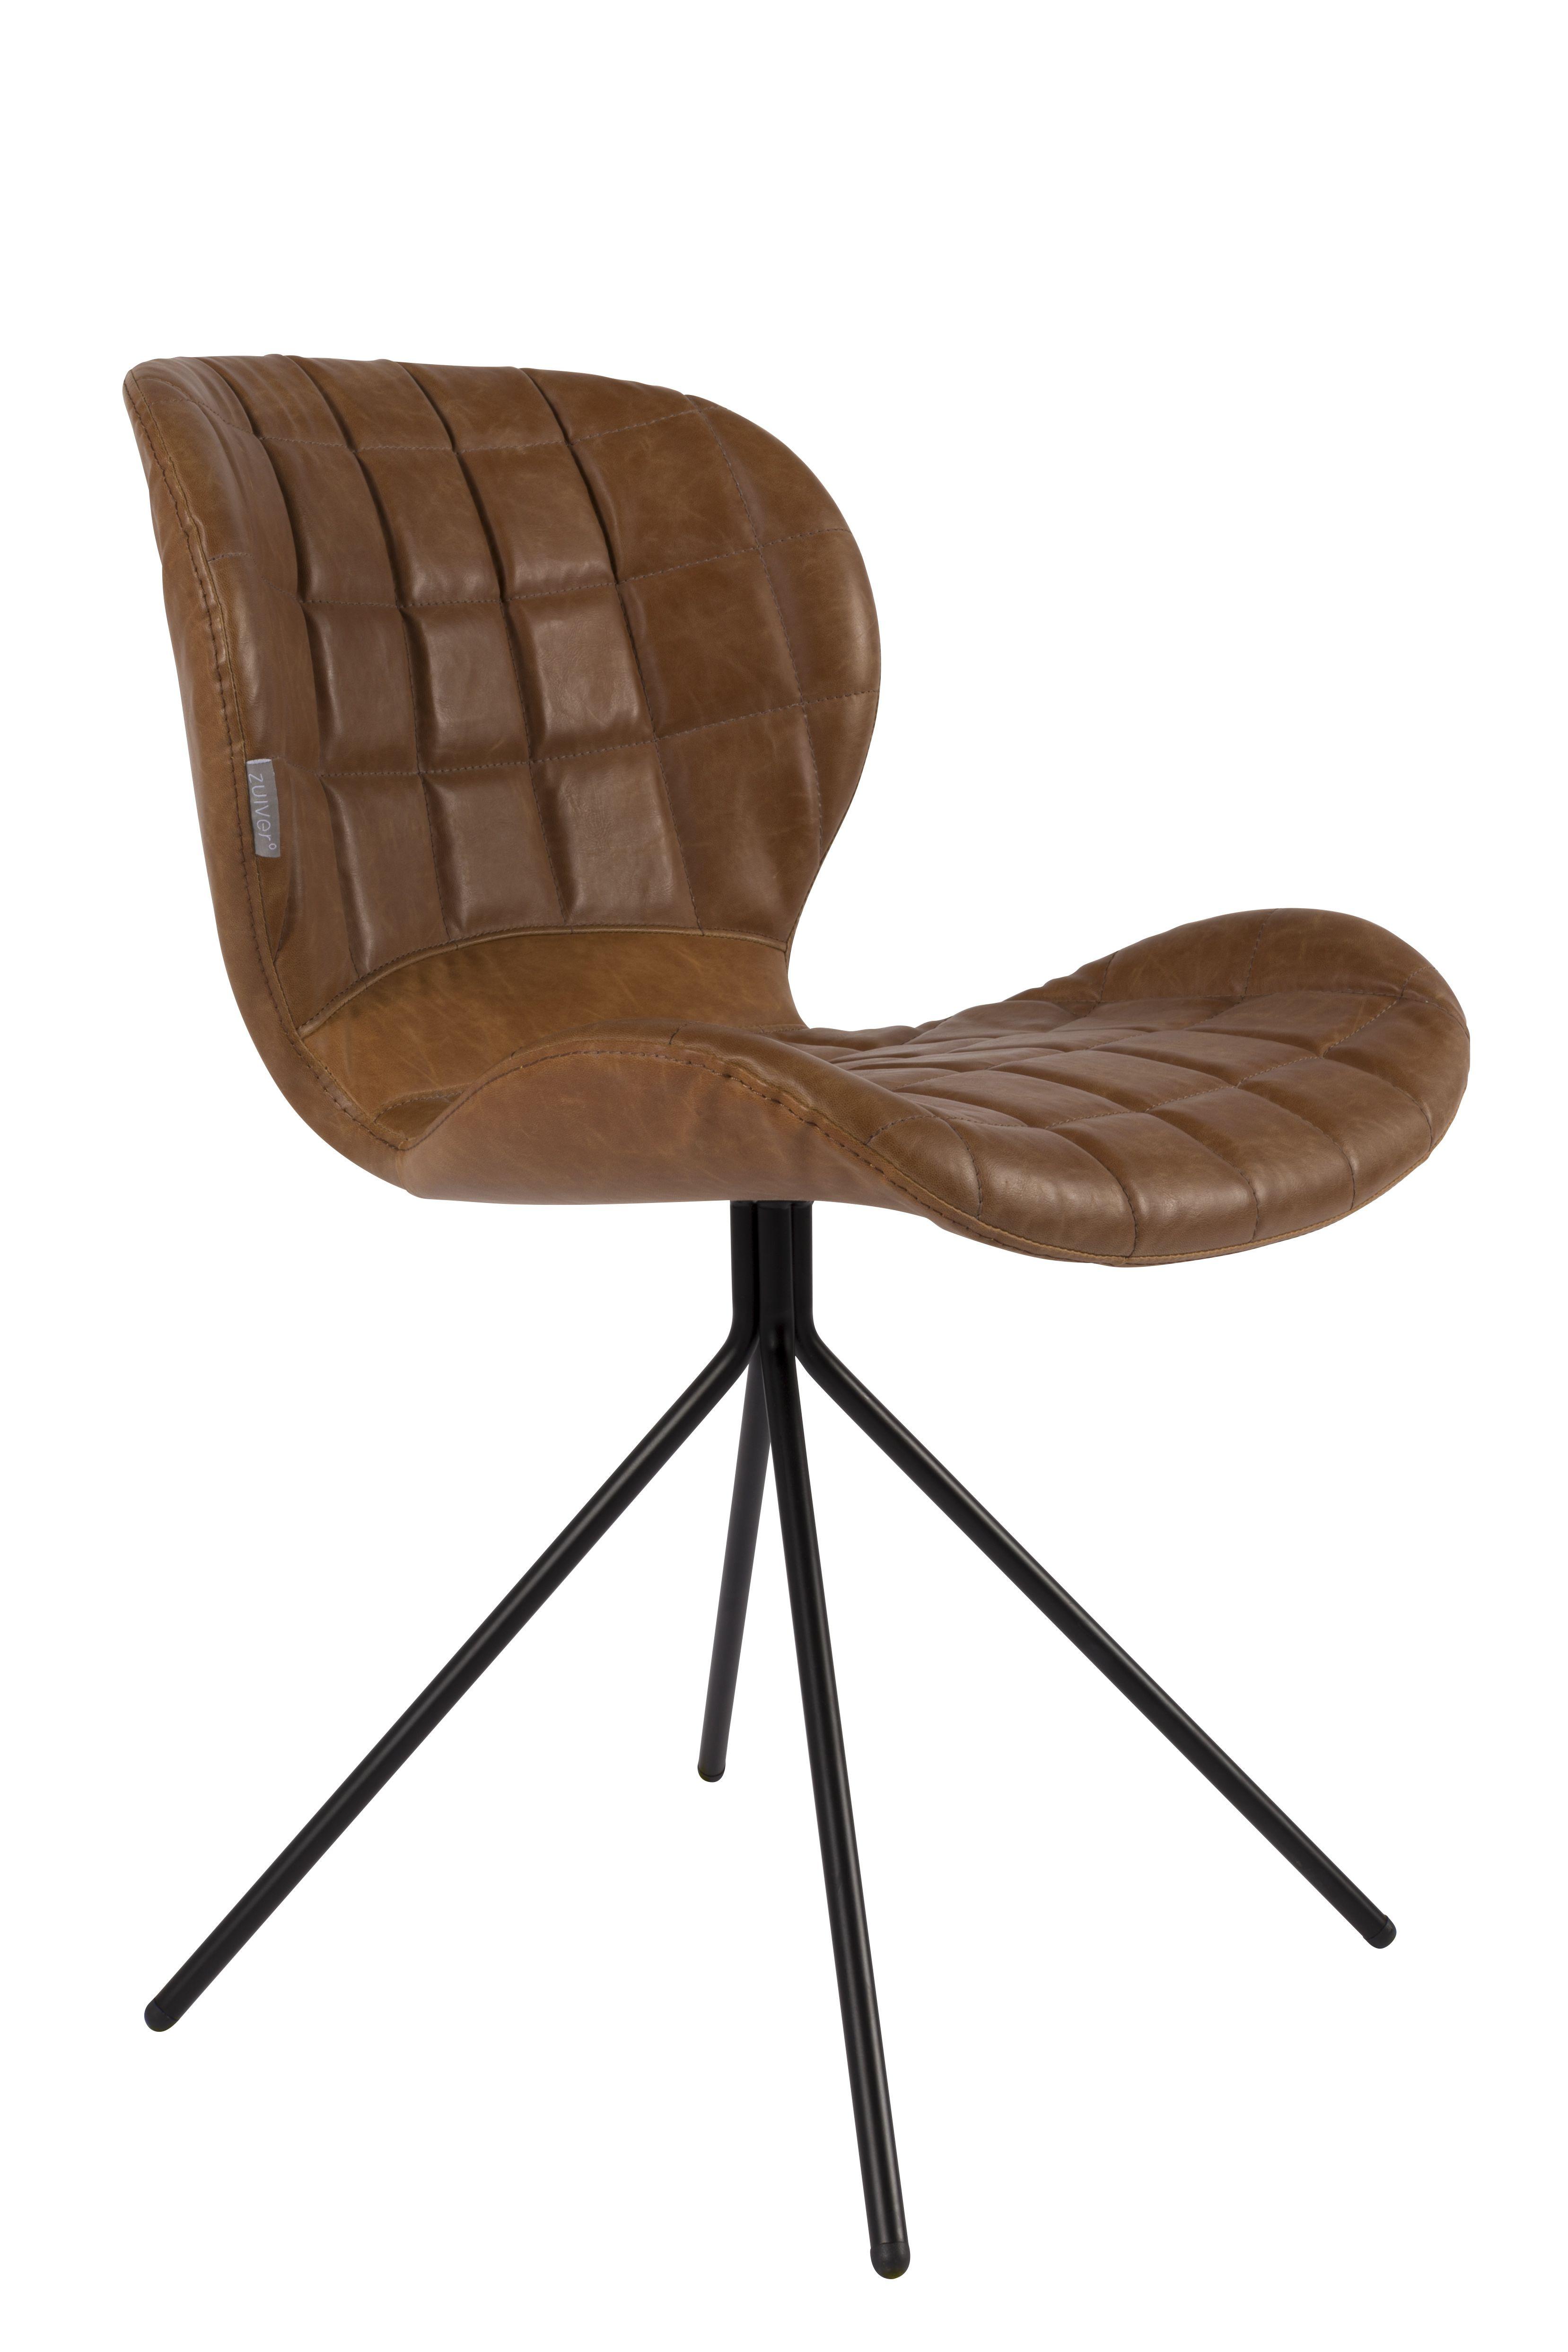 Stoelen merken with stoelen merken perfect la redoute for Merk stoelen